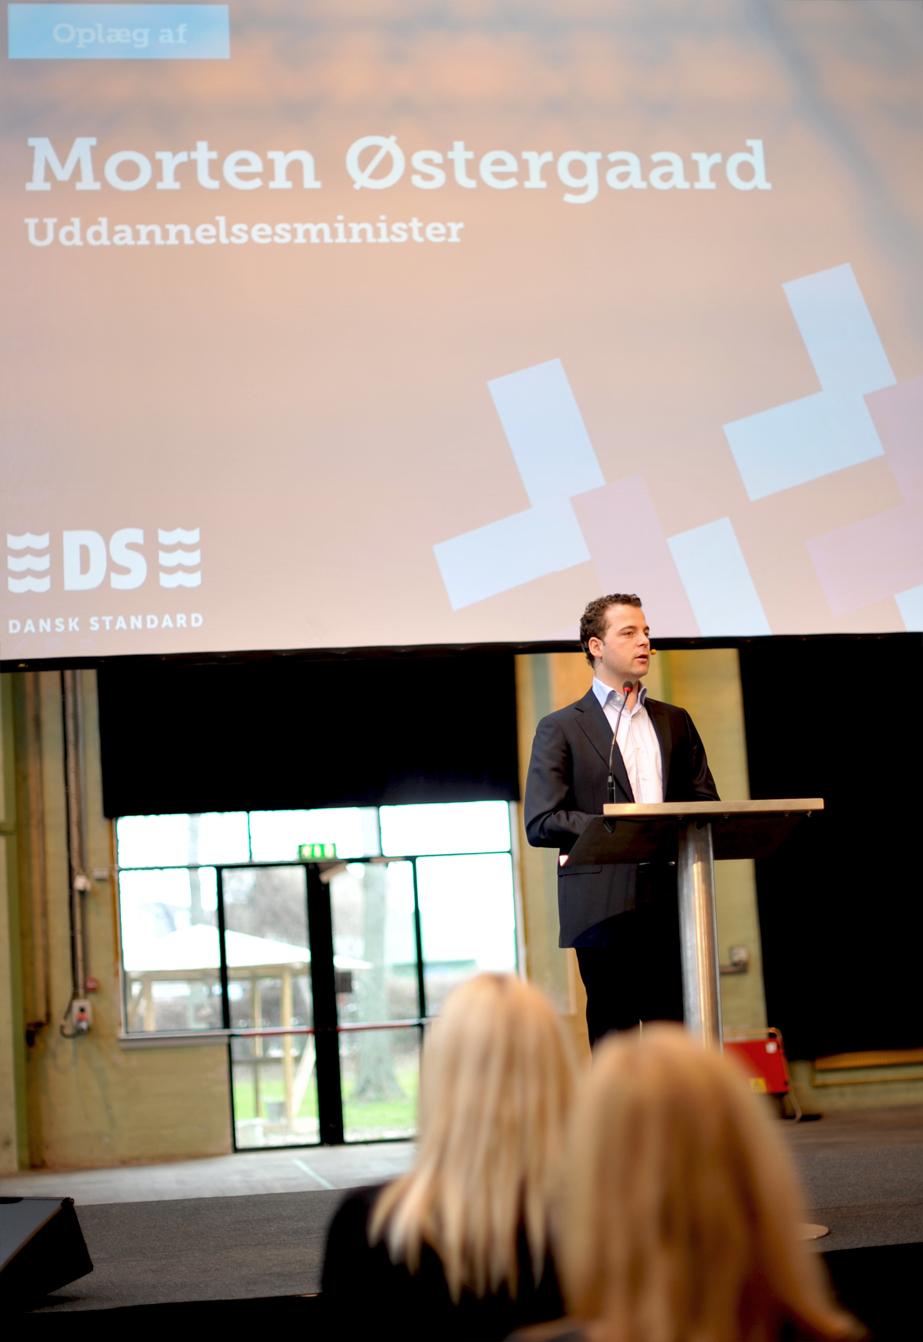 DS - DANSK STANDARD 29.3.2012